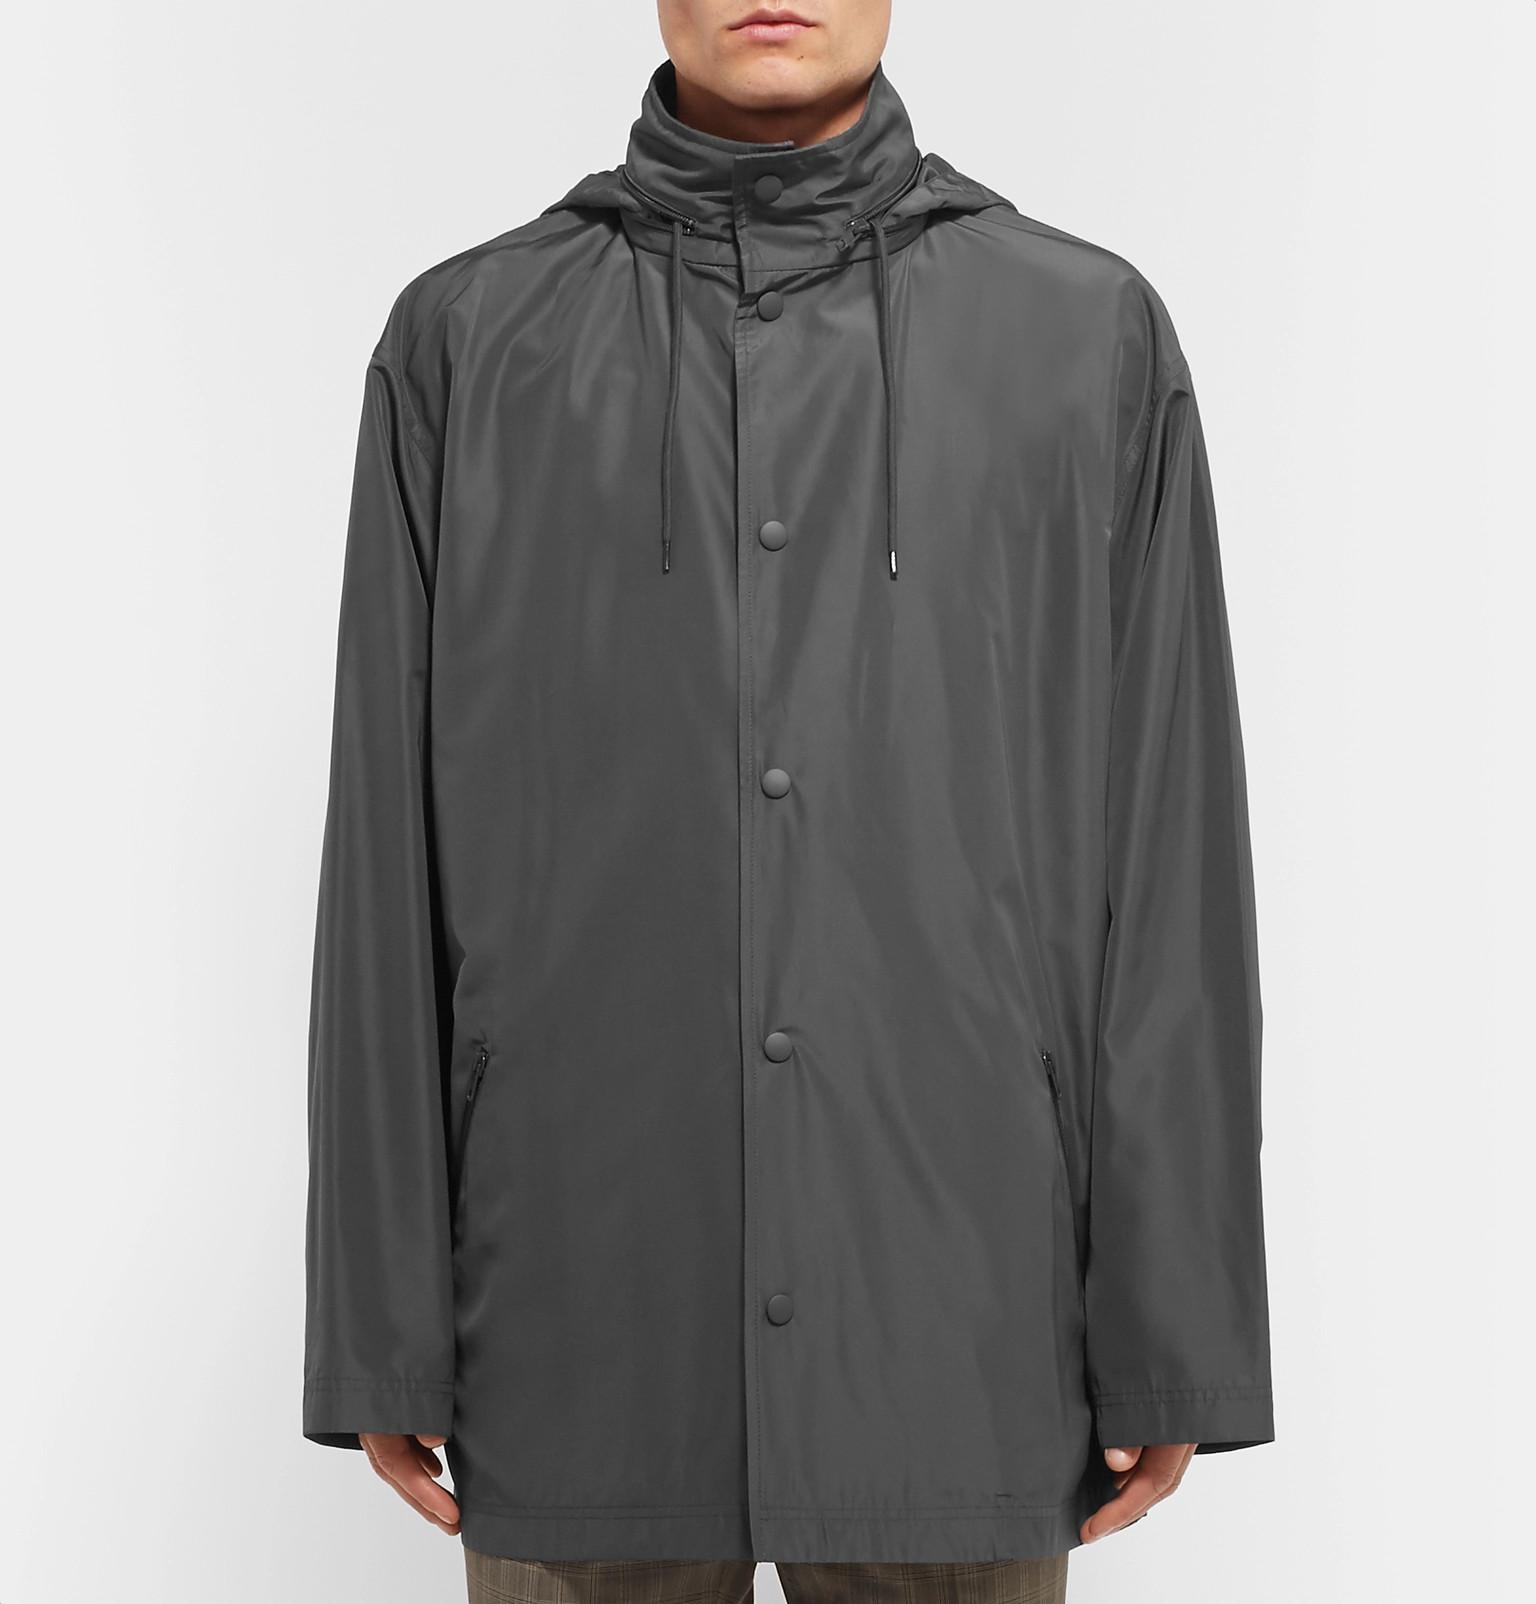 Jacket For Fullscreen Gray Faille Balenciaga Hooded View Lyst Printed Men xpqIWv